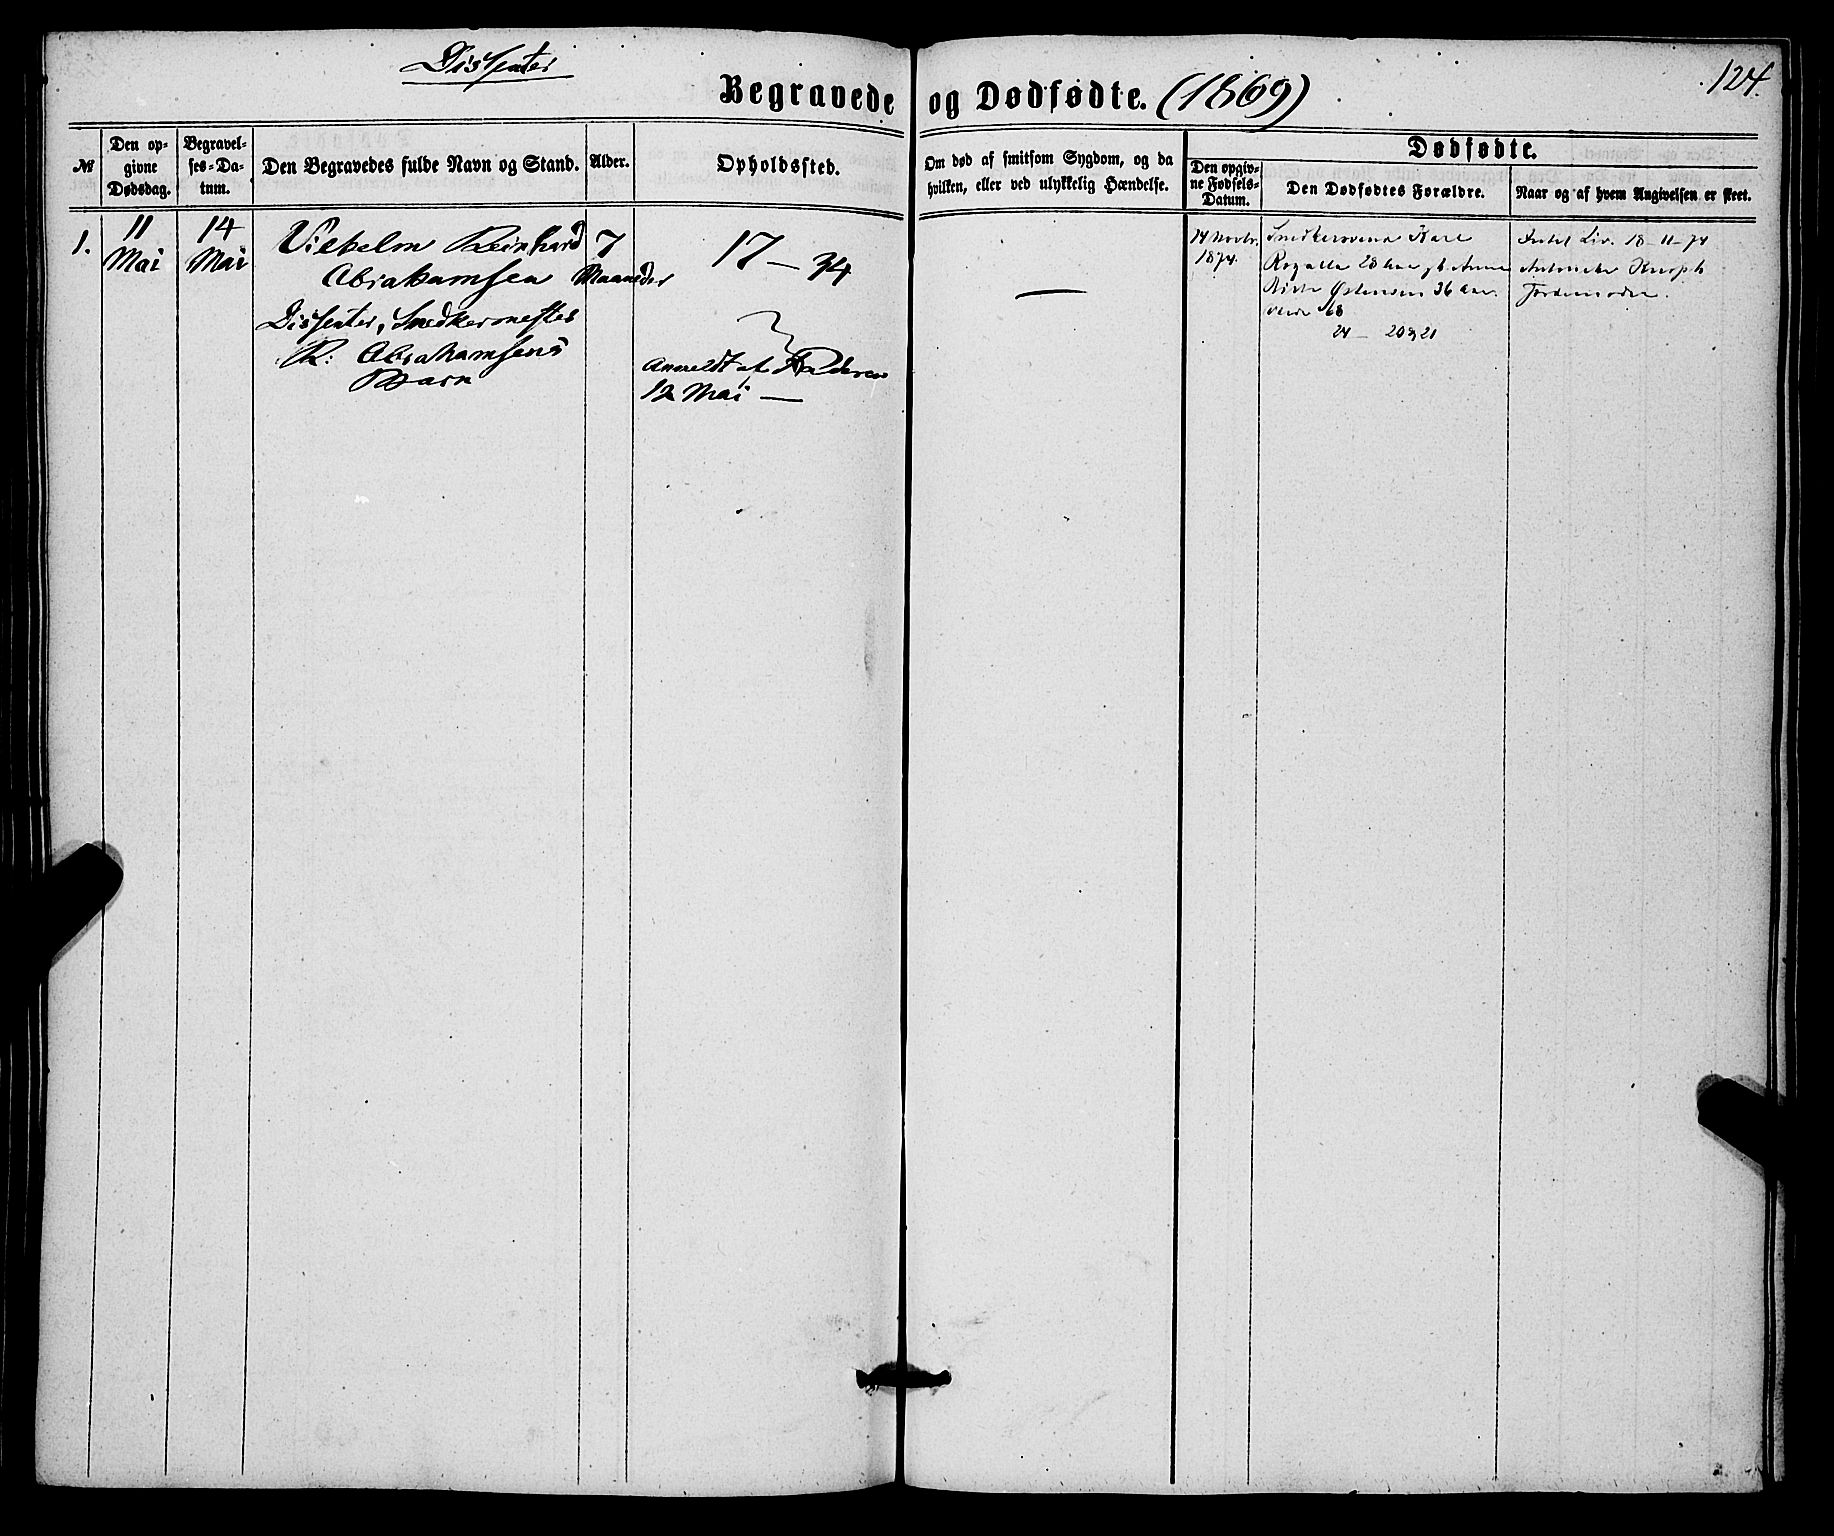 SAB, Korskirken Sokneprestembete, H/Haa/L0045: Ministerialbok nr. E 3, 1863-1875, s. 124